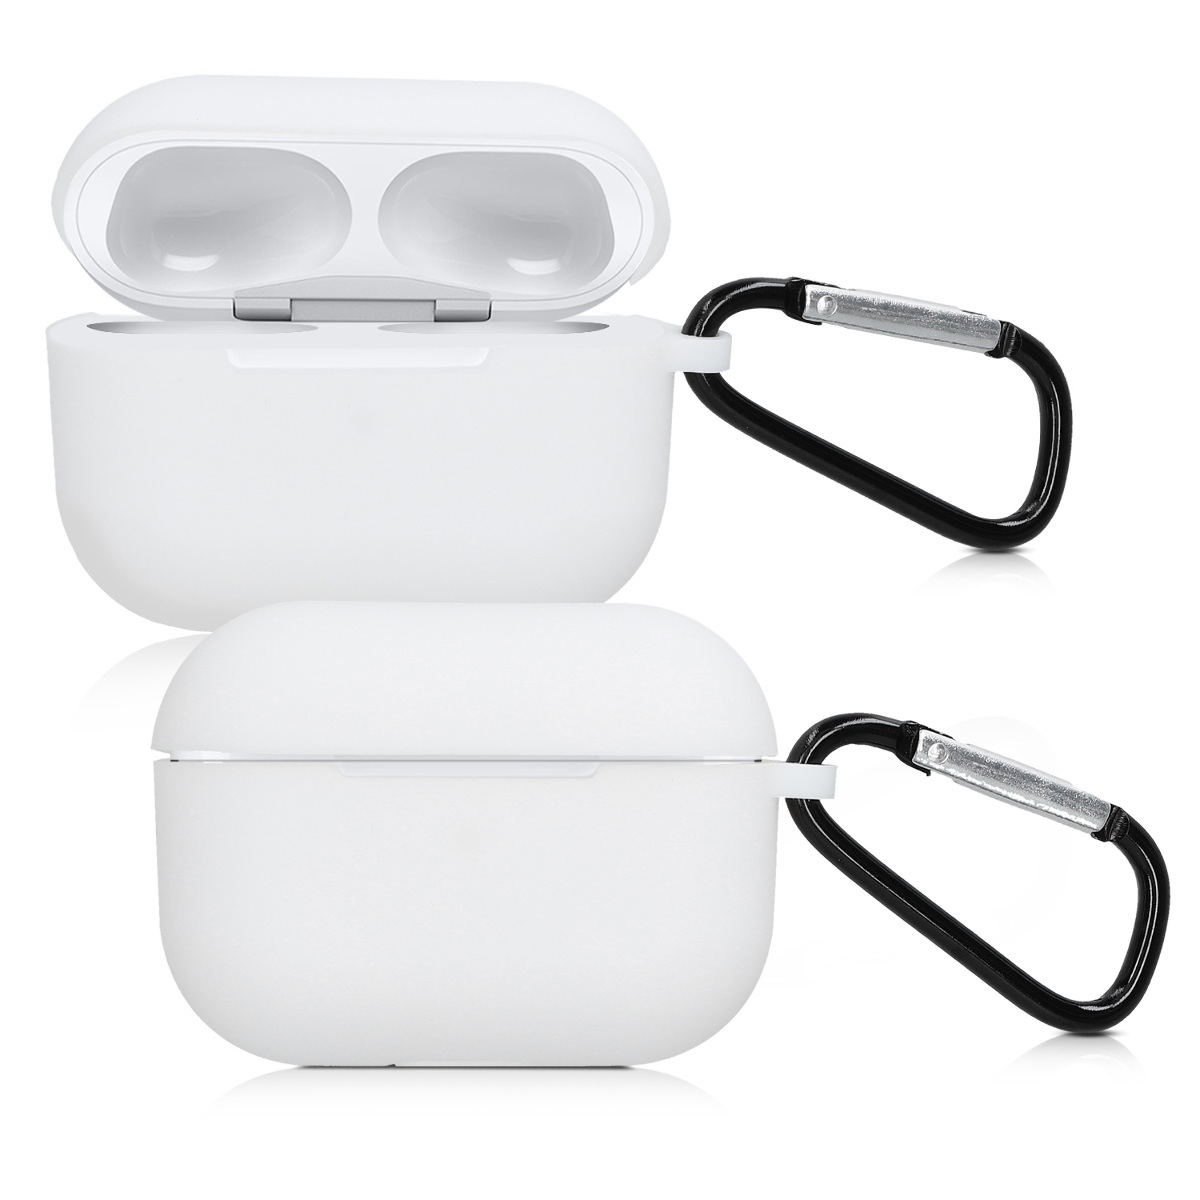 KW Θήκη Σιλικόνης για Apple AirPods Pro - White (50935.02)